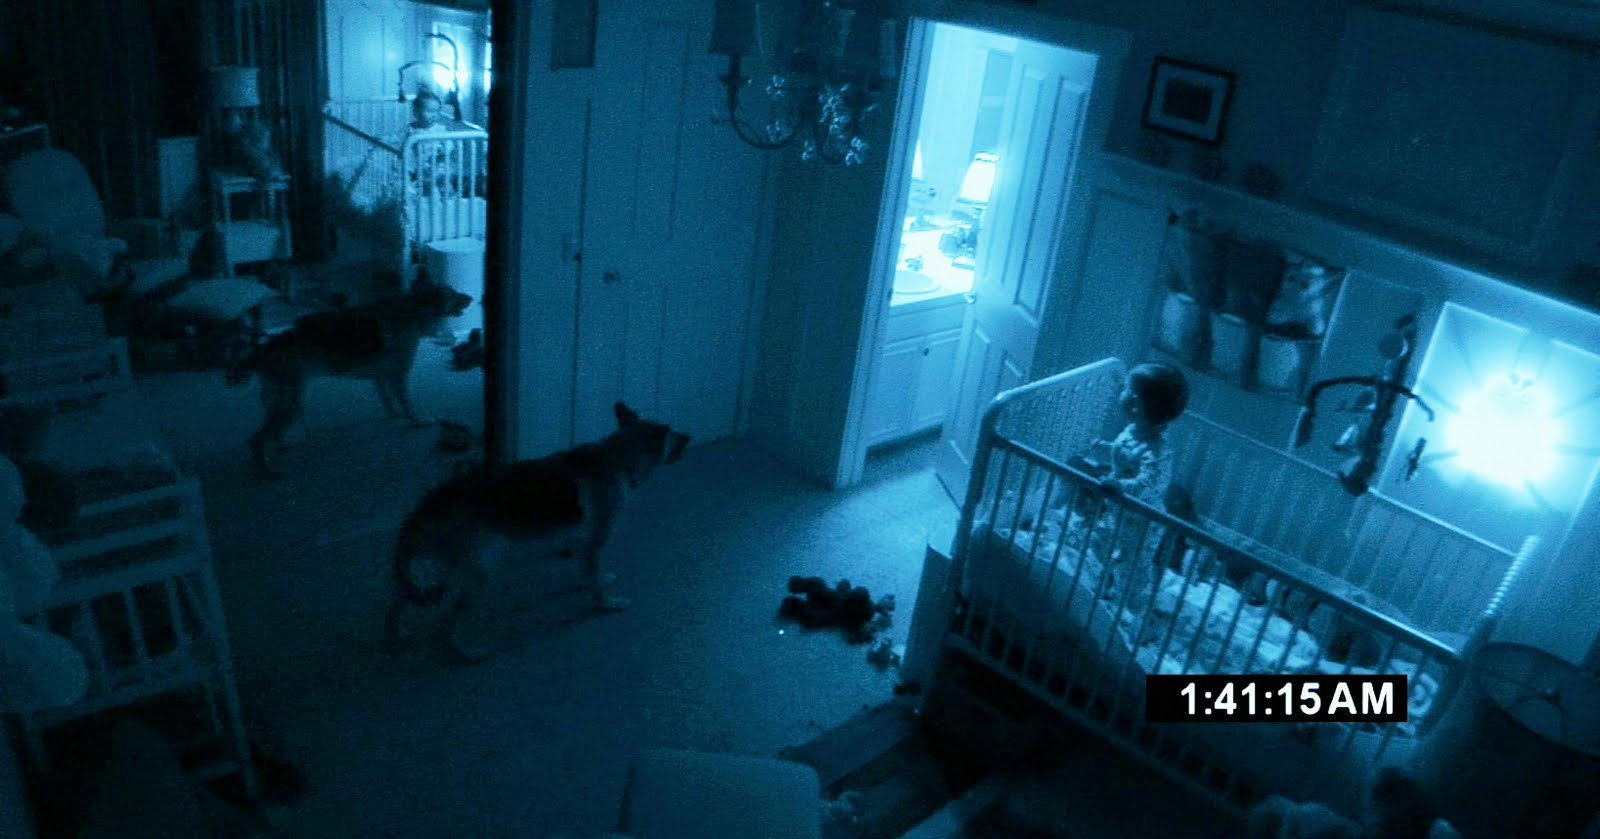 http://1.bp.blogspot.com/_Ma1d0LTftco/TMEizKKyOSI/AAAAAAAABZc/Alj1KD0XgN8/s1600/Paranormal-Activity-2.jpg